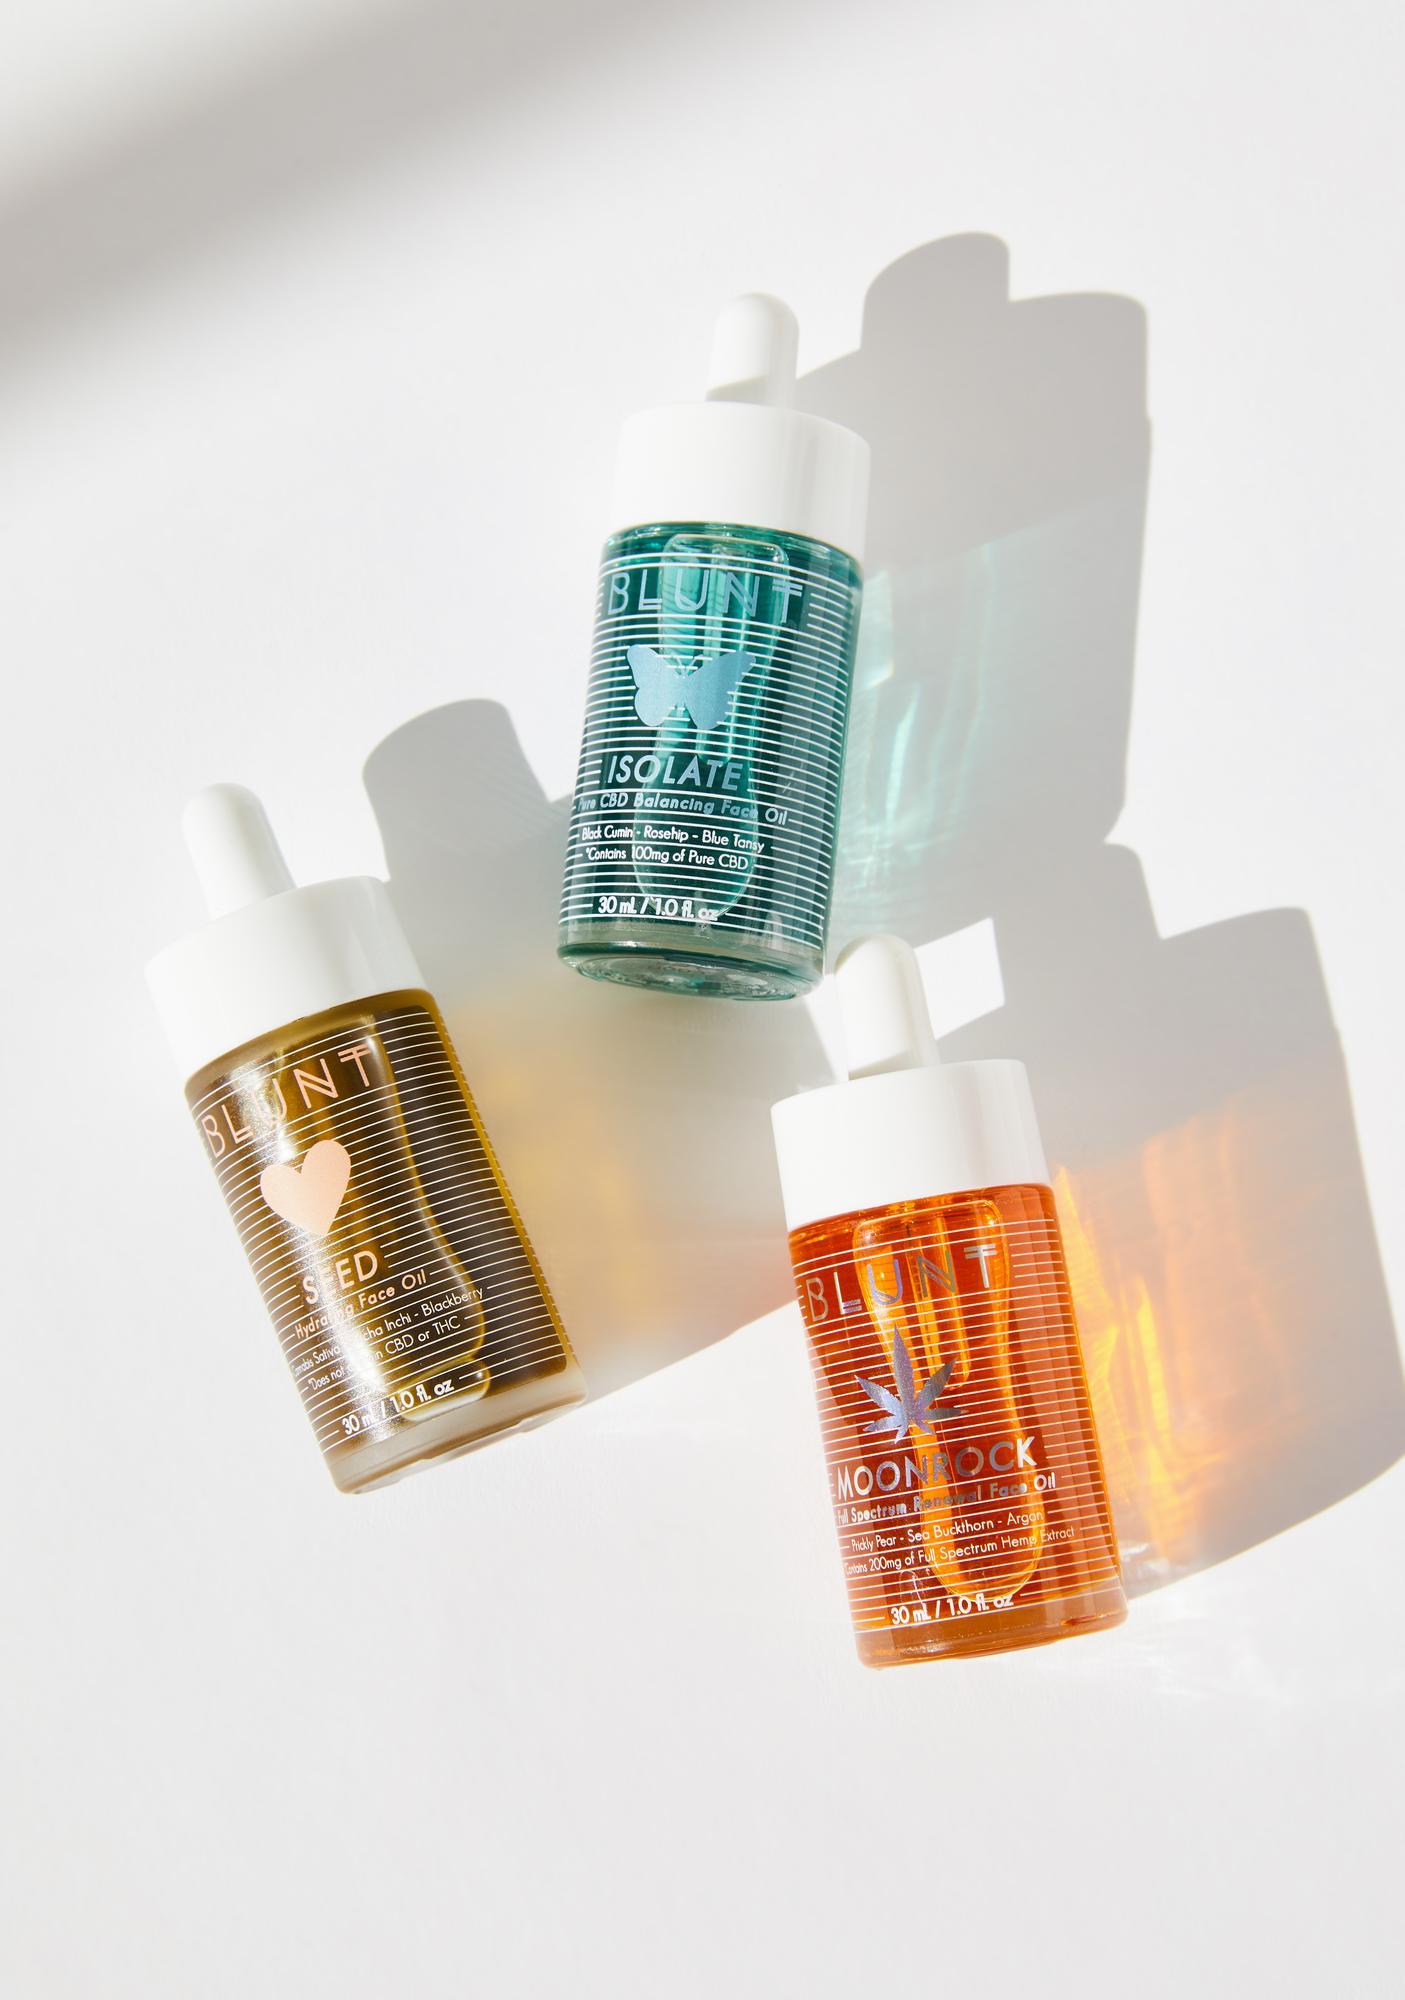 BLUNT Skincare Isolate Pure CBD Balancing Face Oil